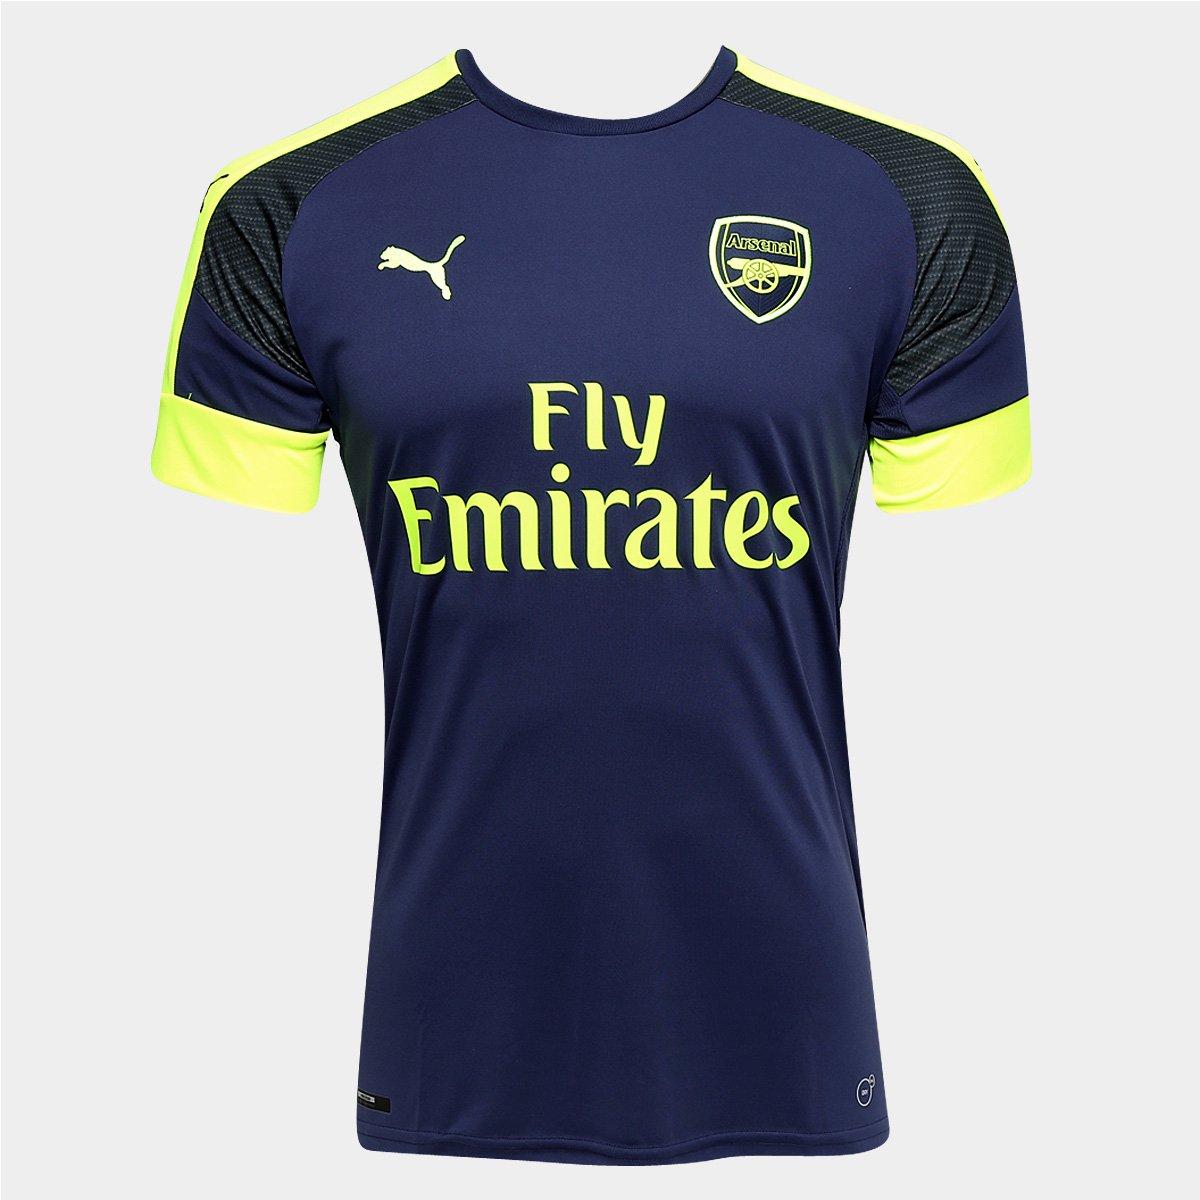 Camisa Arsenal Third 16 17 s nº Torcedor Puma Masculina - Compre Agora  ee2e7d34f318d